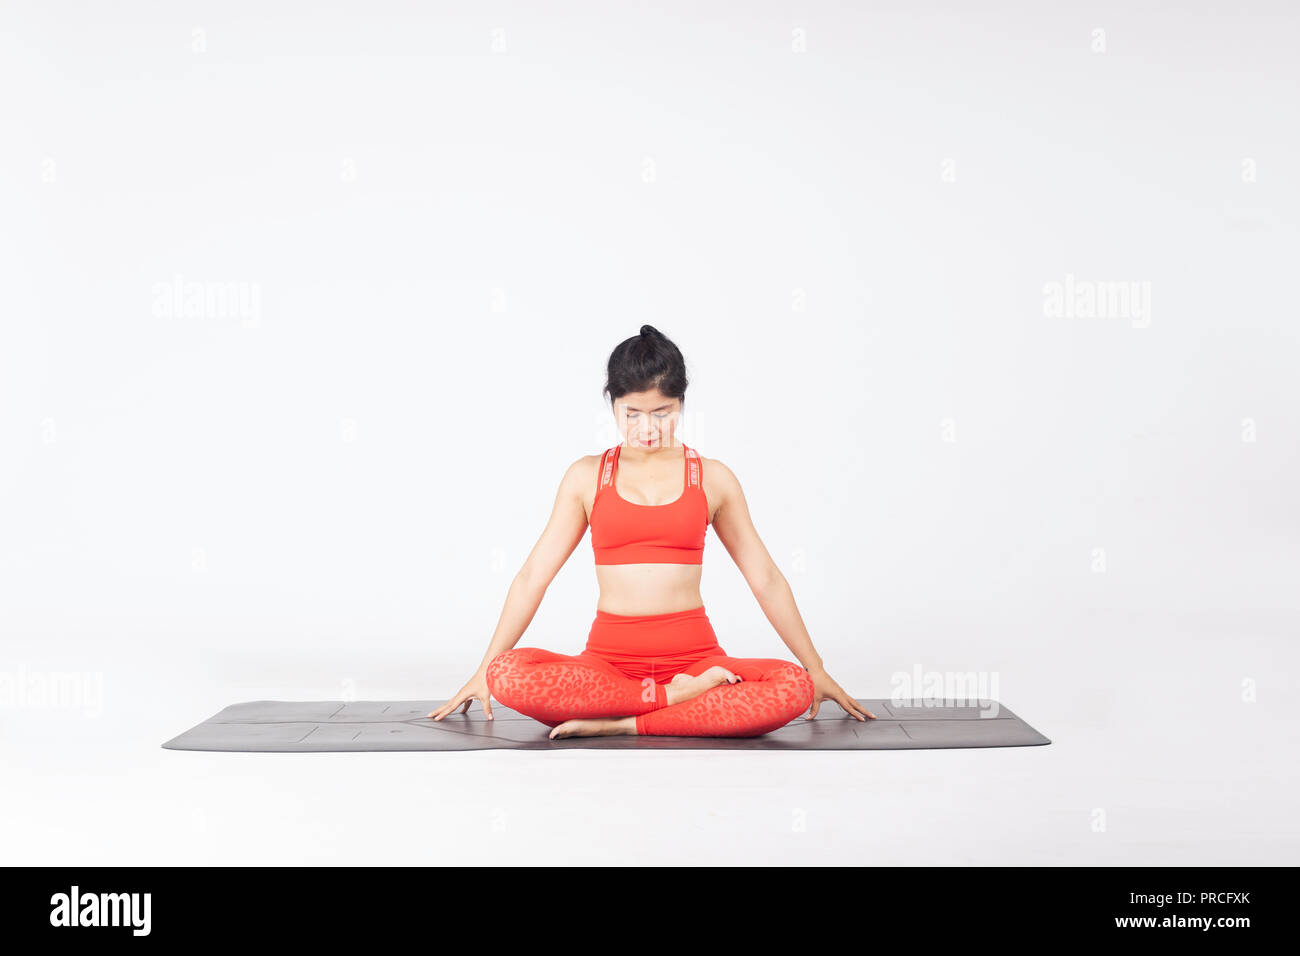 Woman practicing yoga - Stock Image